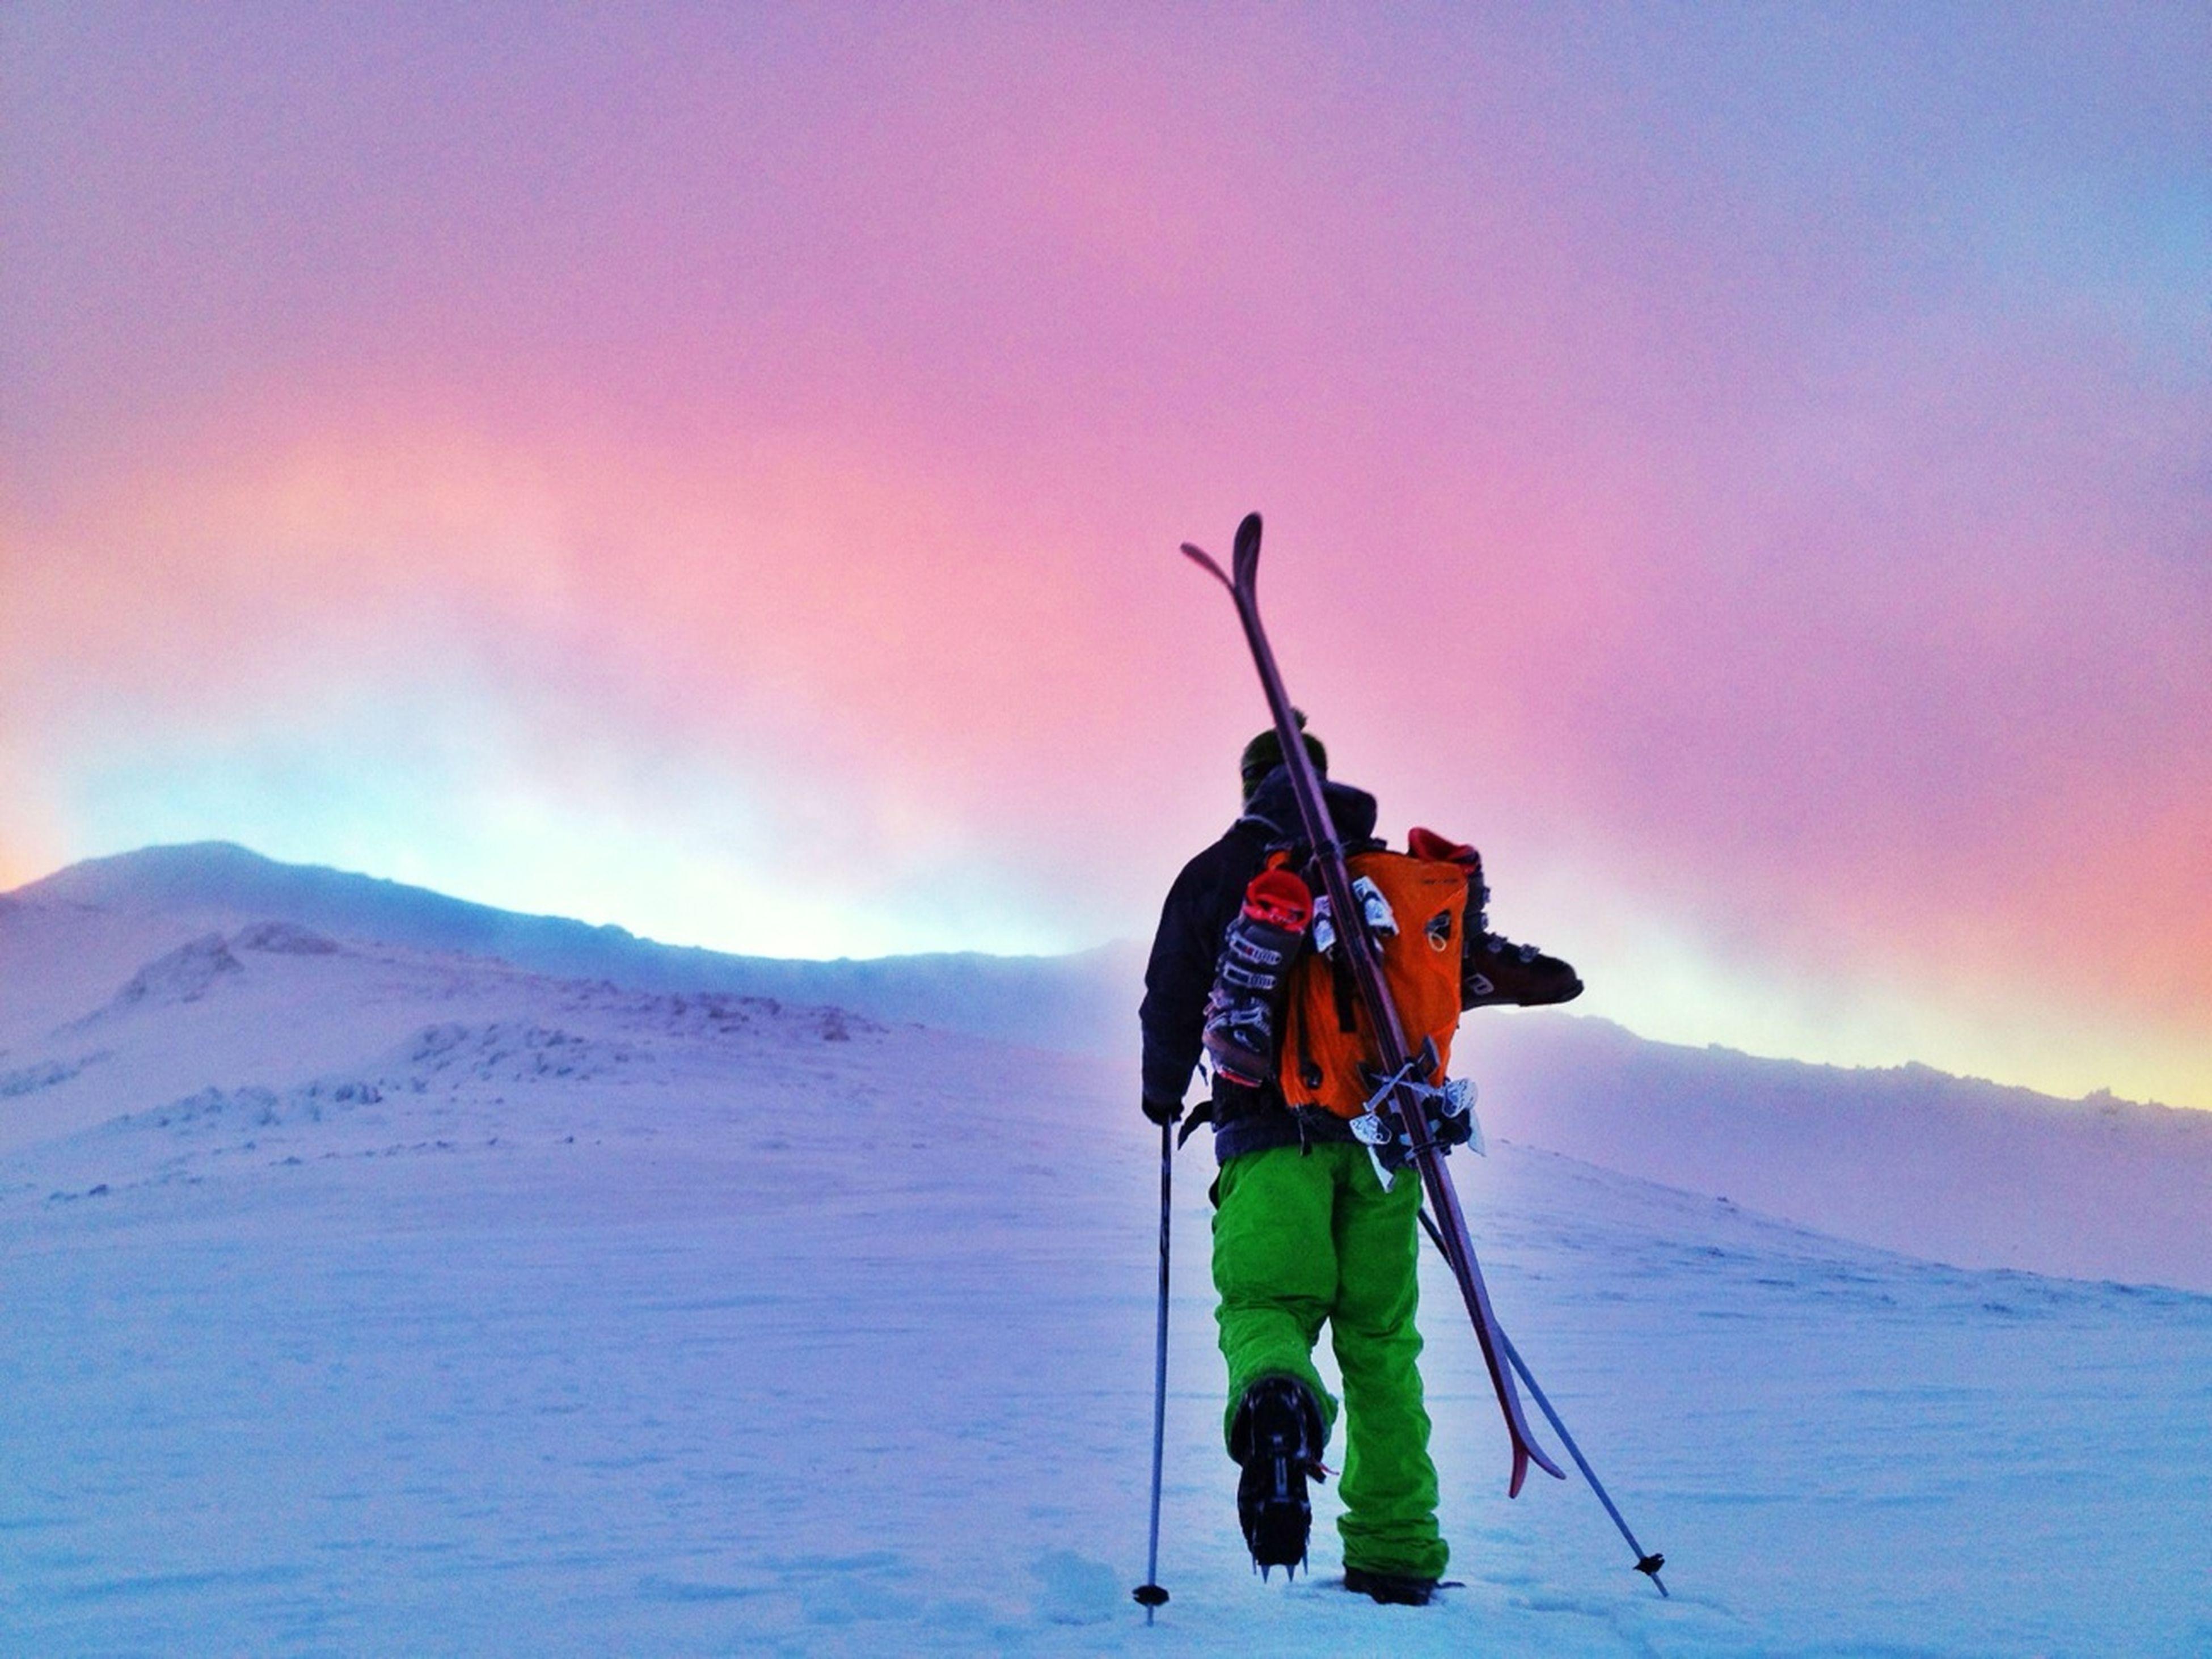 #FF #Fotofriday Para @arobledano Qué Grande Es!! Muchas Gracias!! #esquídemontaña #skimountaineering #skimo #cabezasdehierro #training #mountain #ilovemountain #sunrise #amanecer #sinfiltros #dynafit #lights